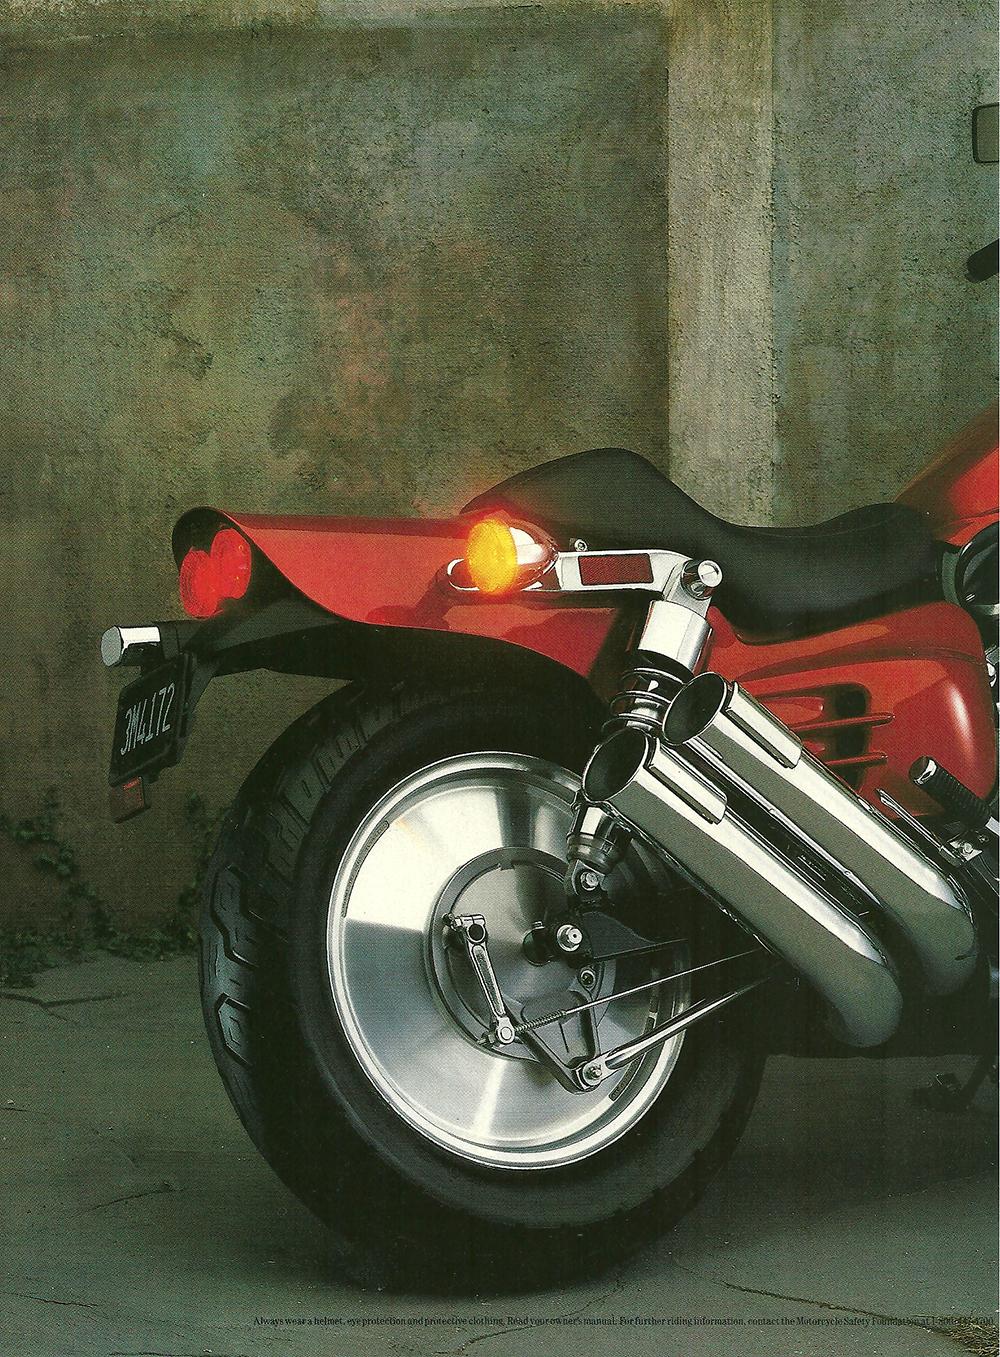 1987 Honda 700 Magna road test 06.jpg